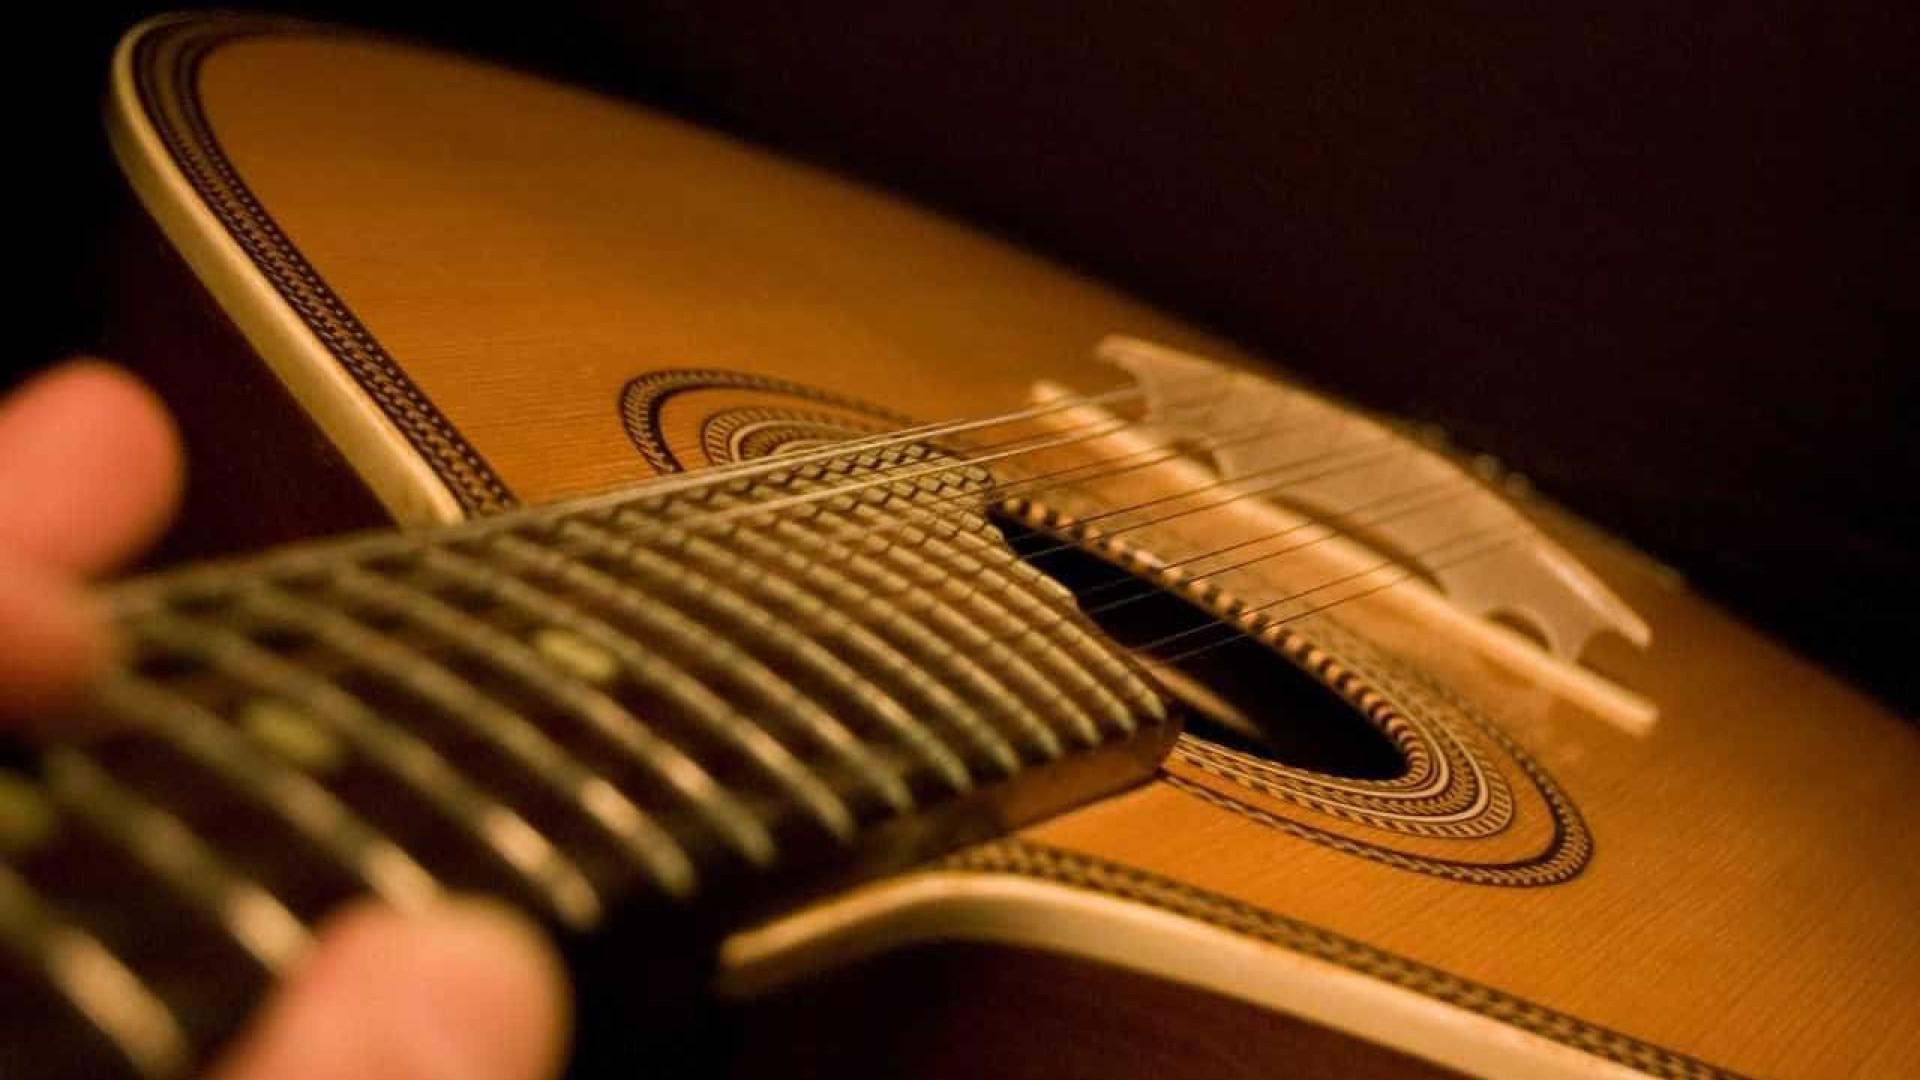 Concerto virtual de fado assinala Dia Internacional da Língua Portuguesa